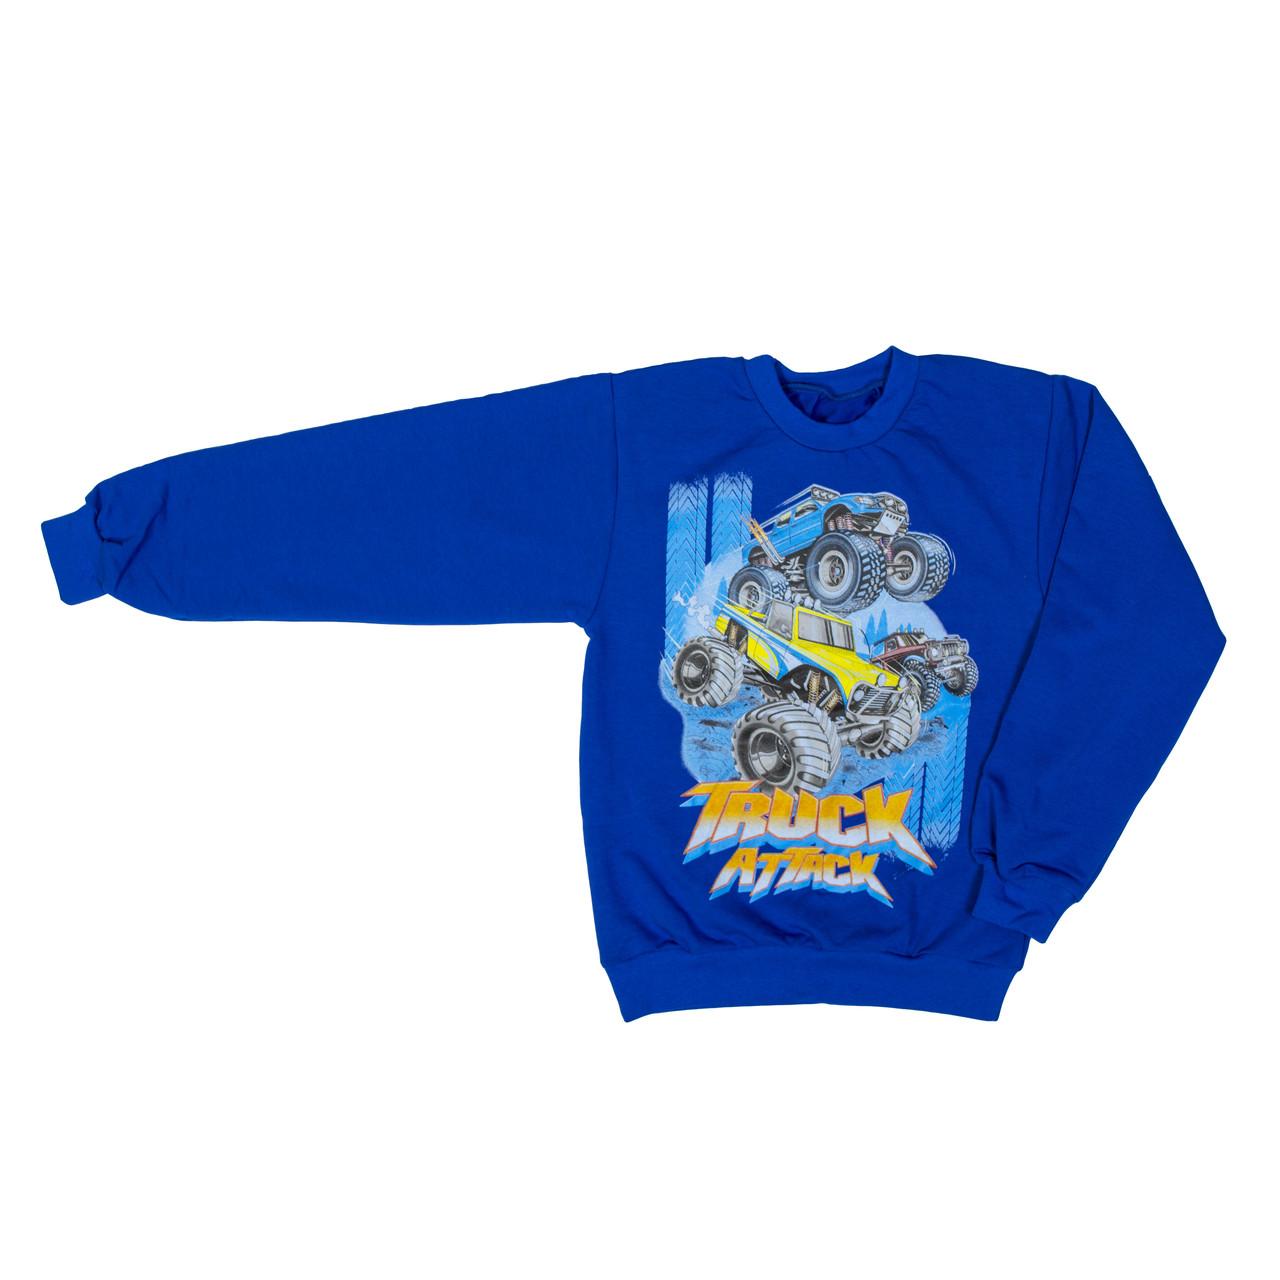 Джемпер для мальчика синий